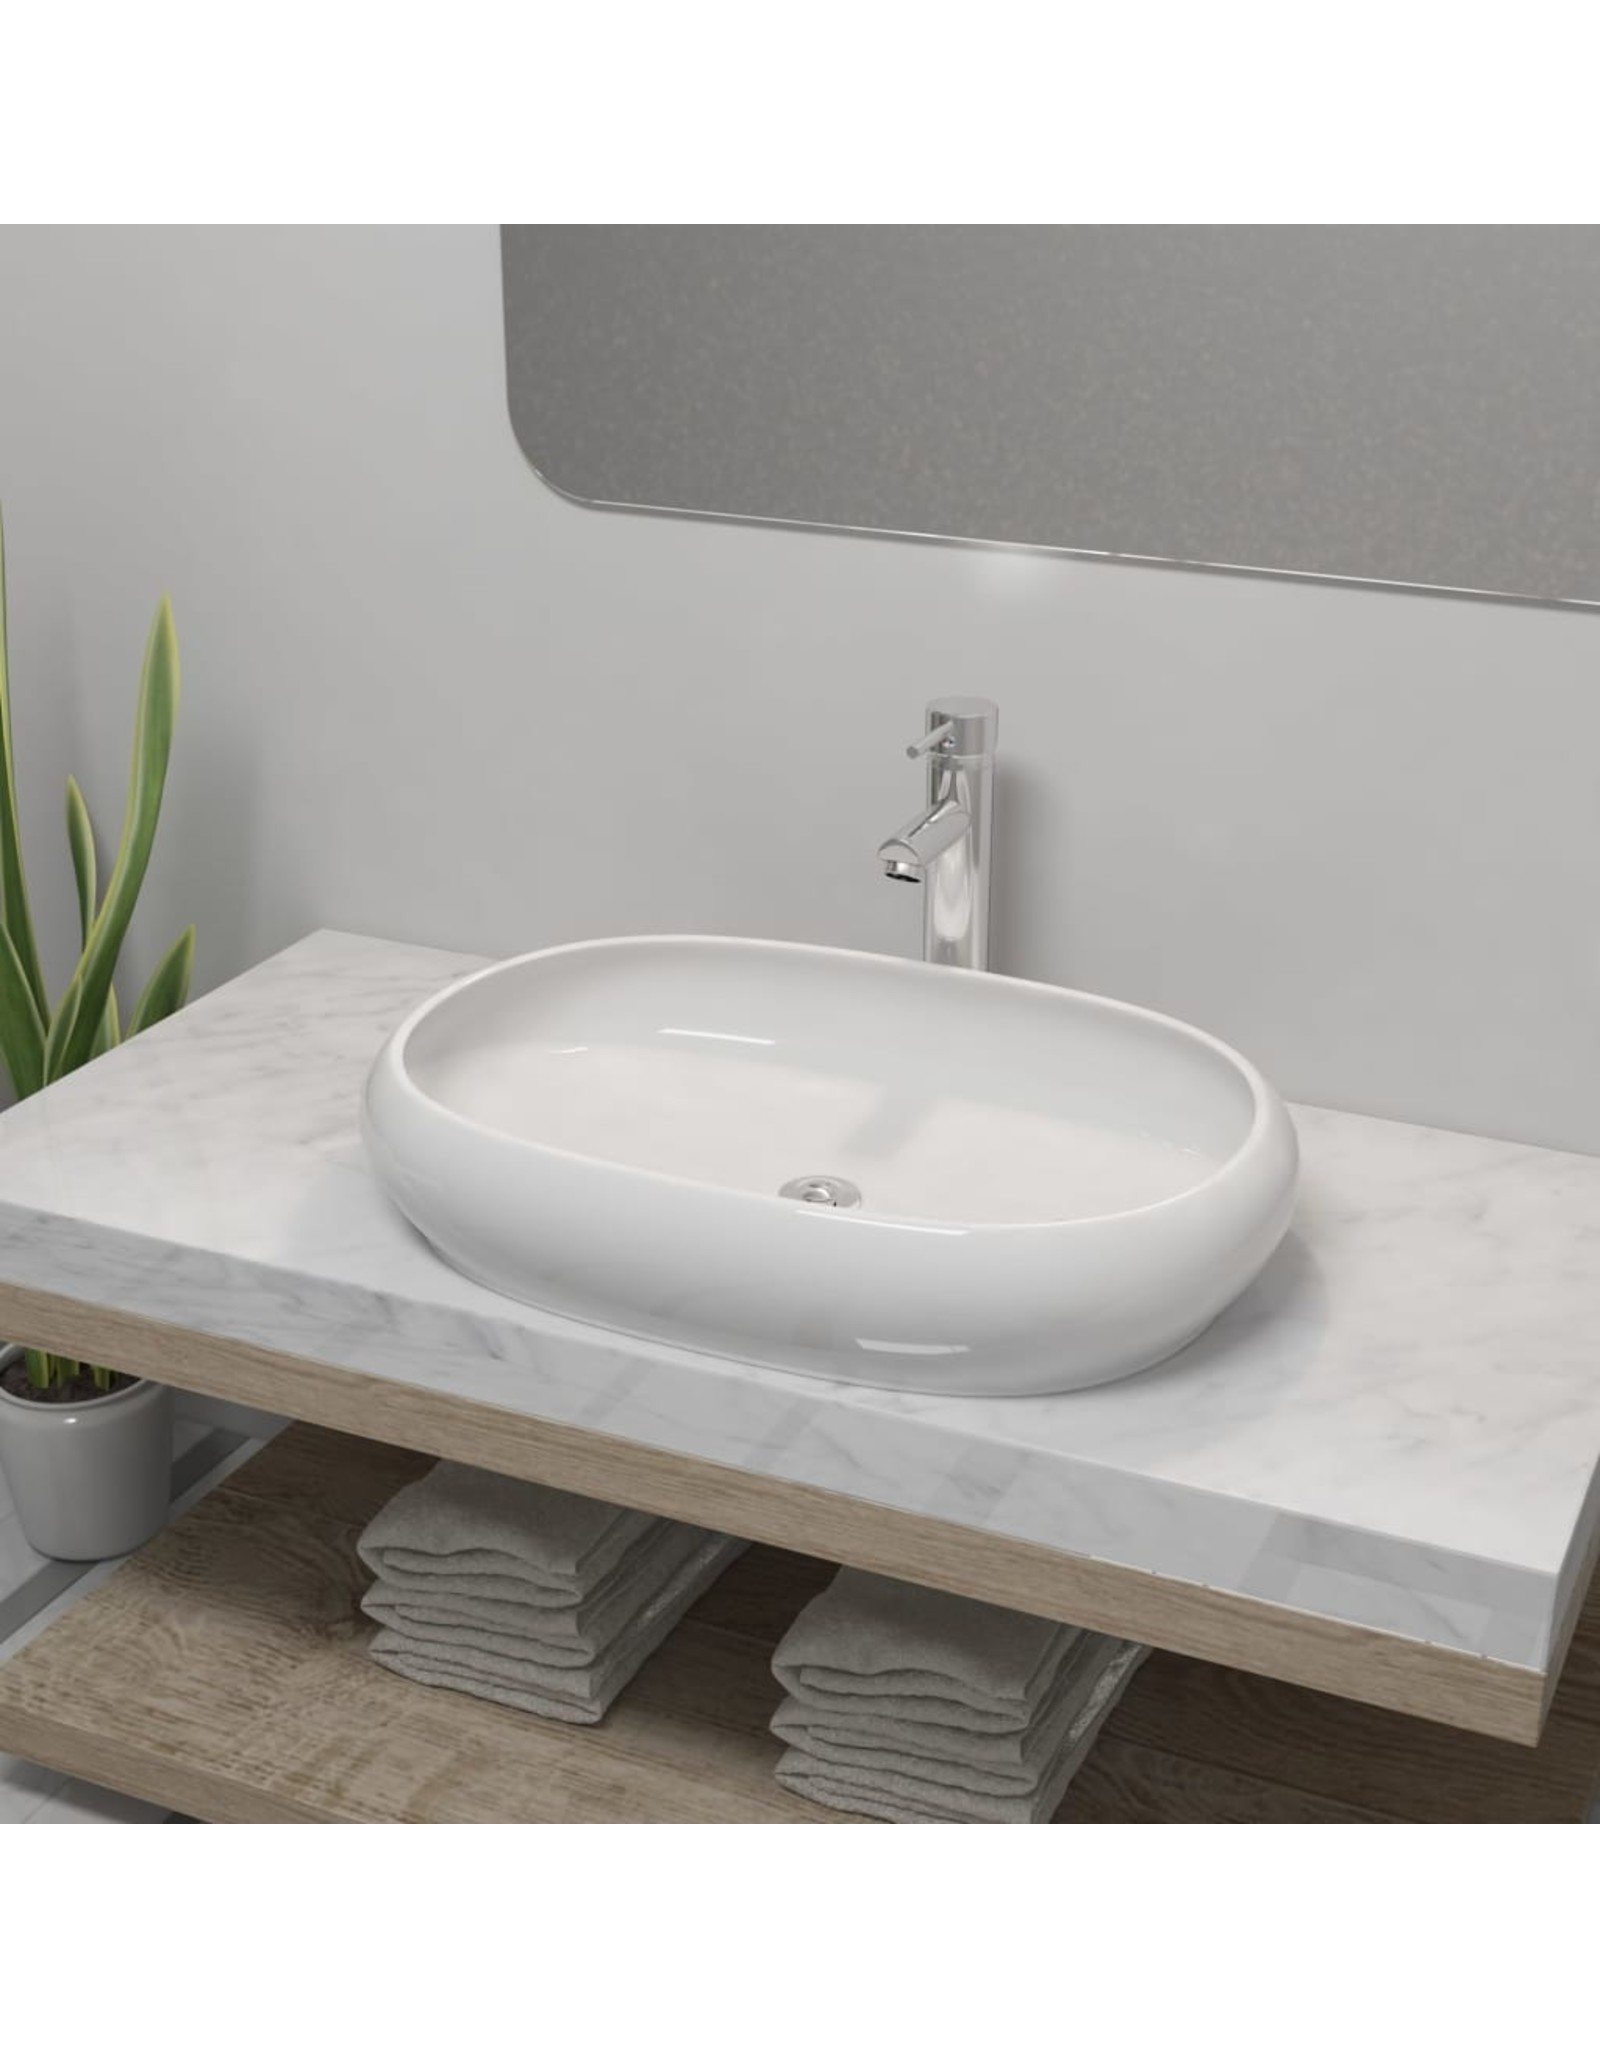 Badkamerwastafel met mengkraan ovaal keramiek wit